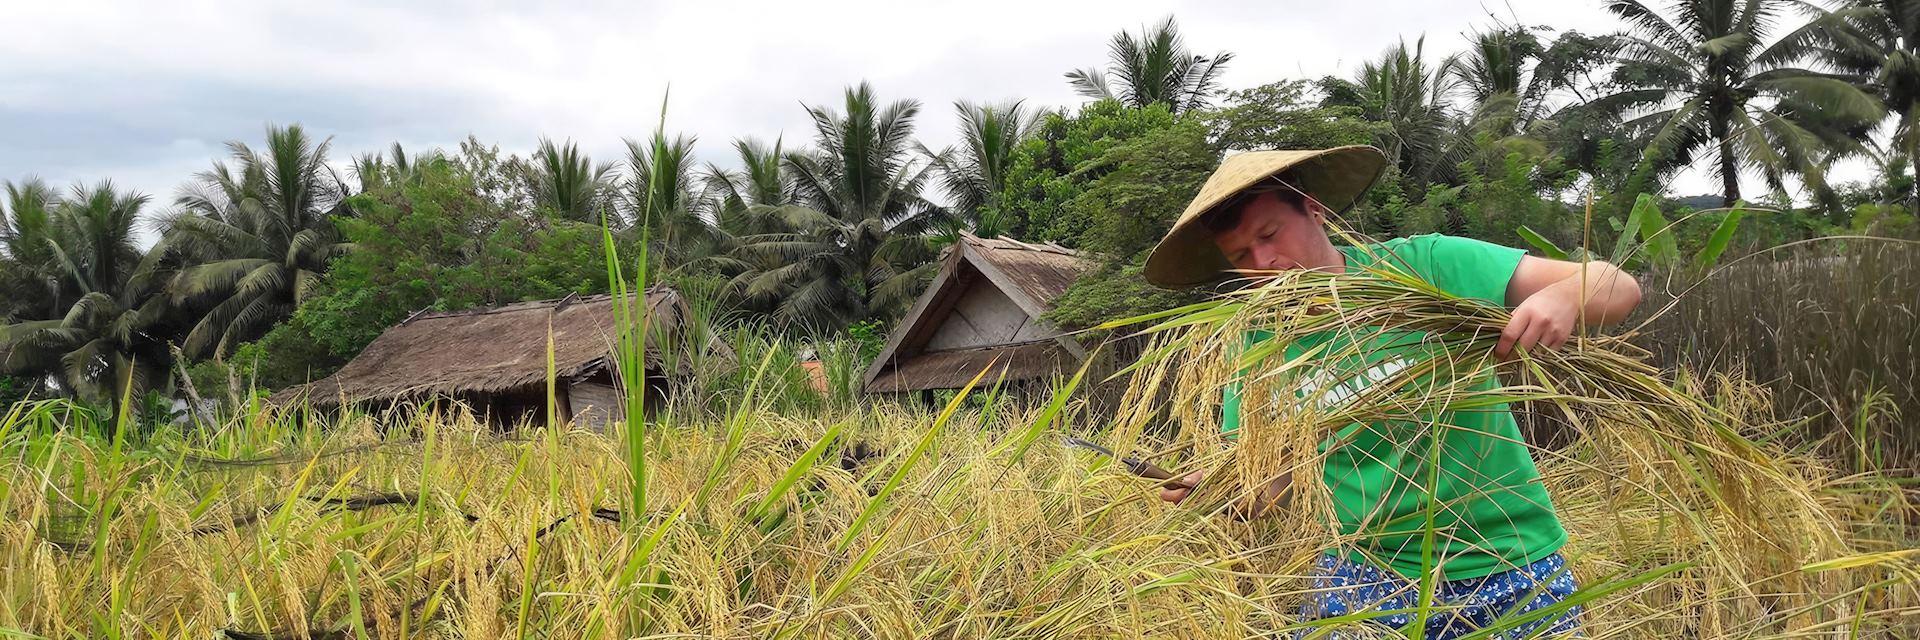 Ross harvesting rice, Vietnam